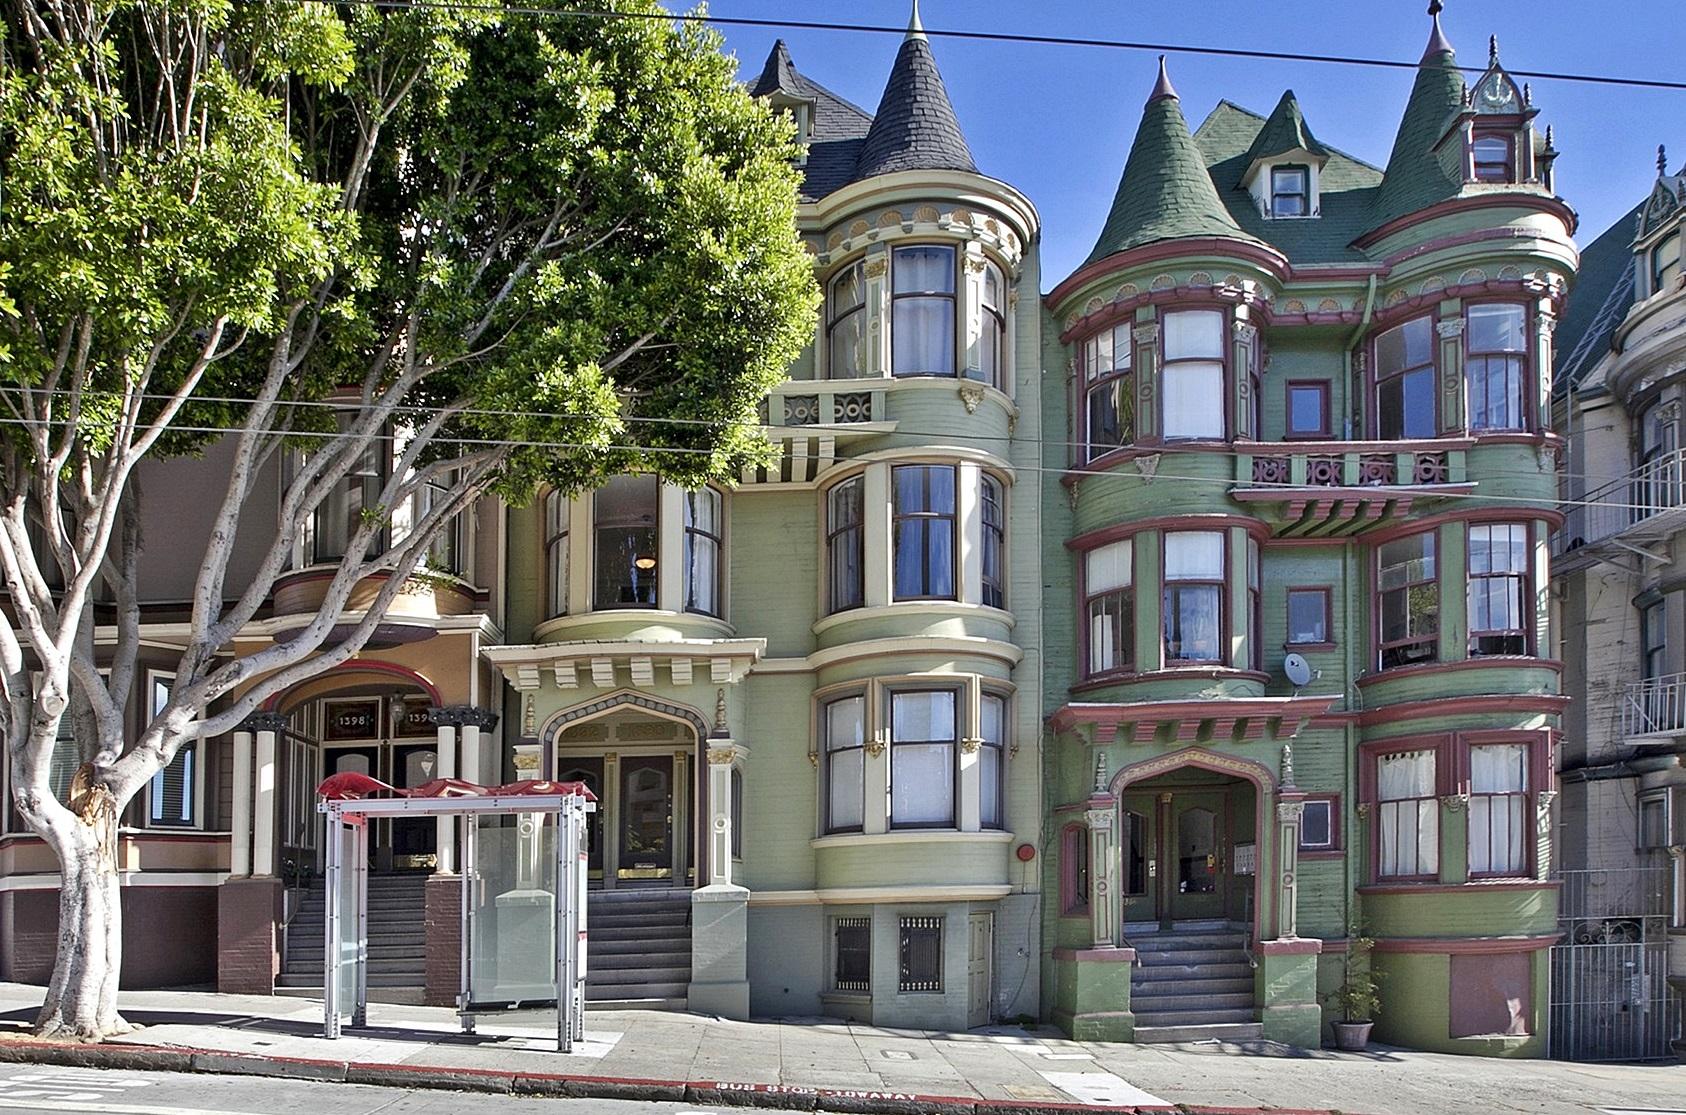 1390 Mcallister St, San Francisco, CA 94115